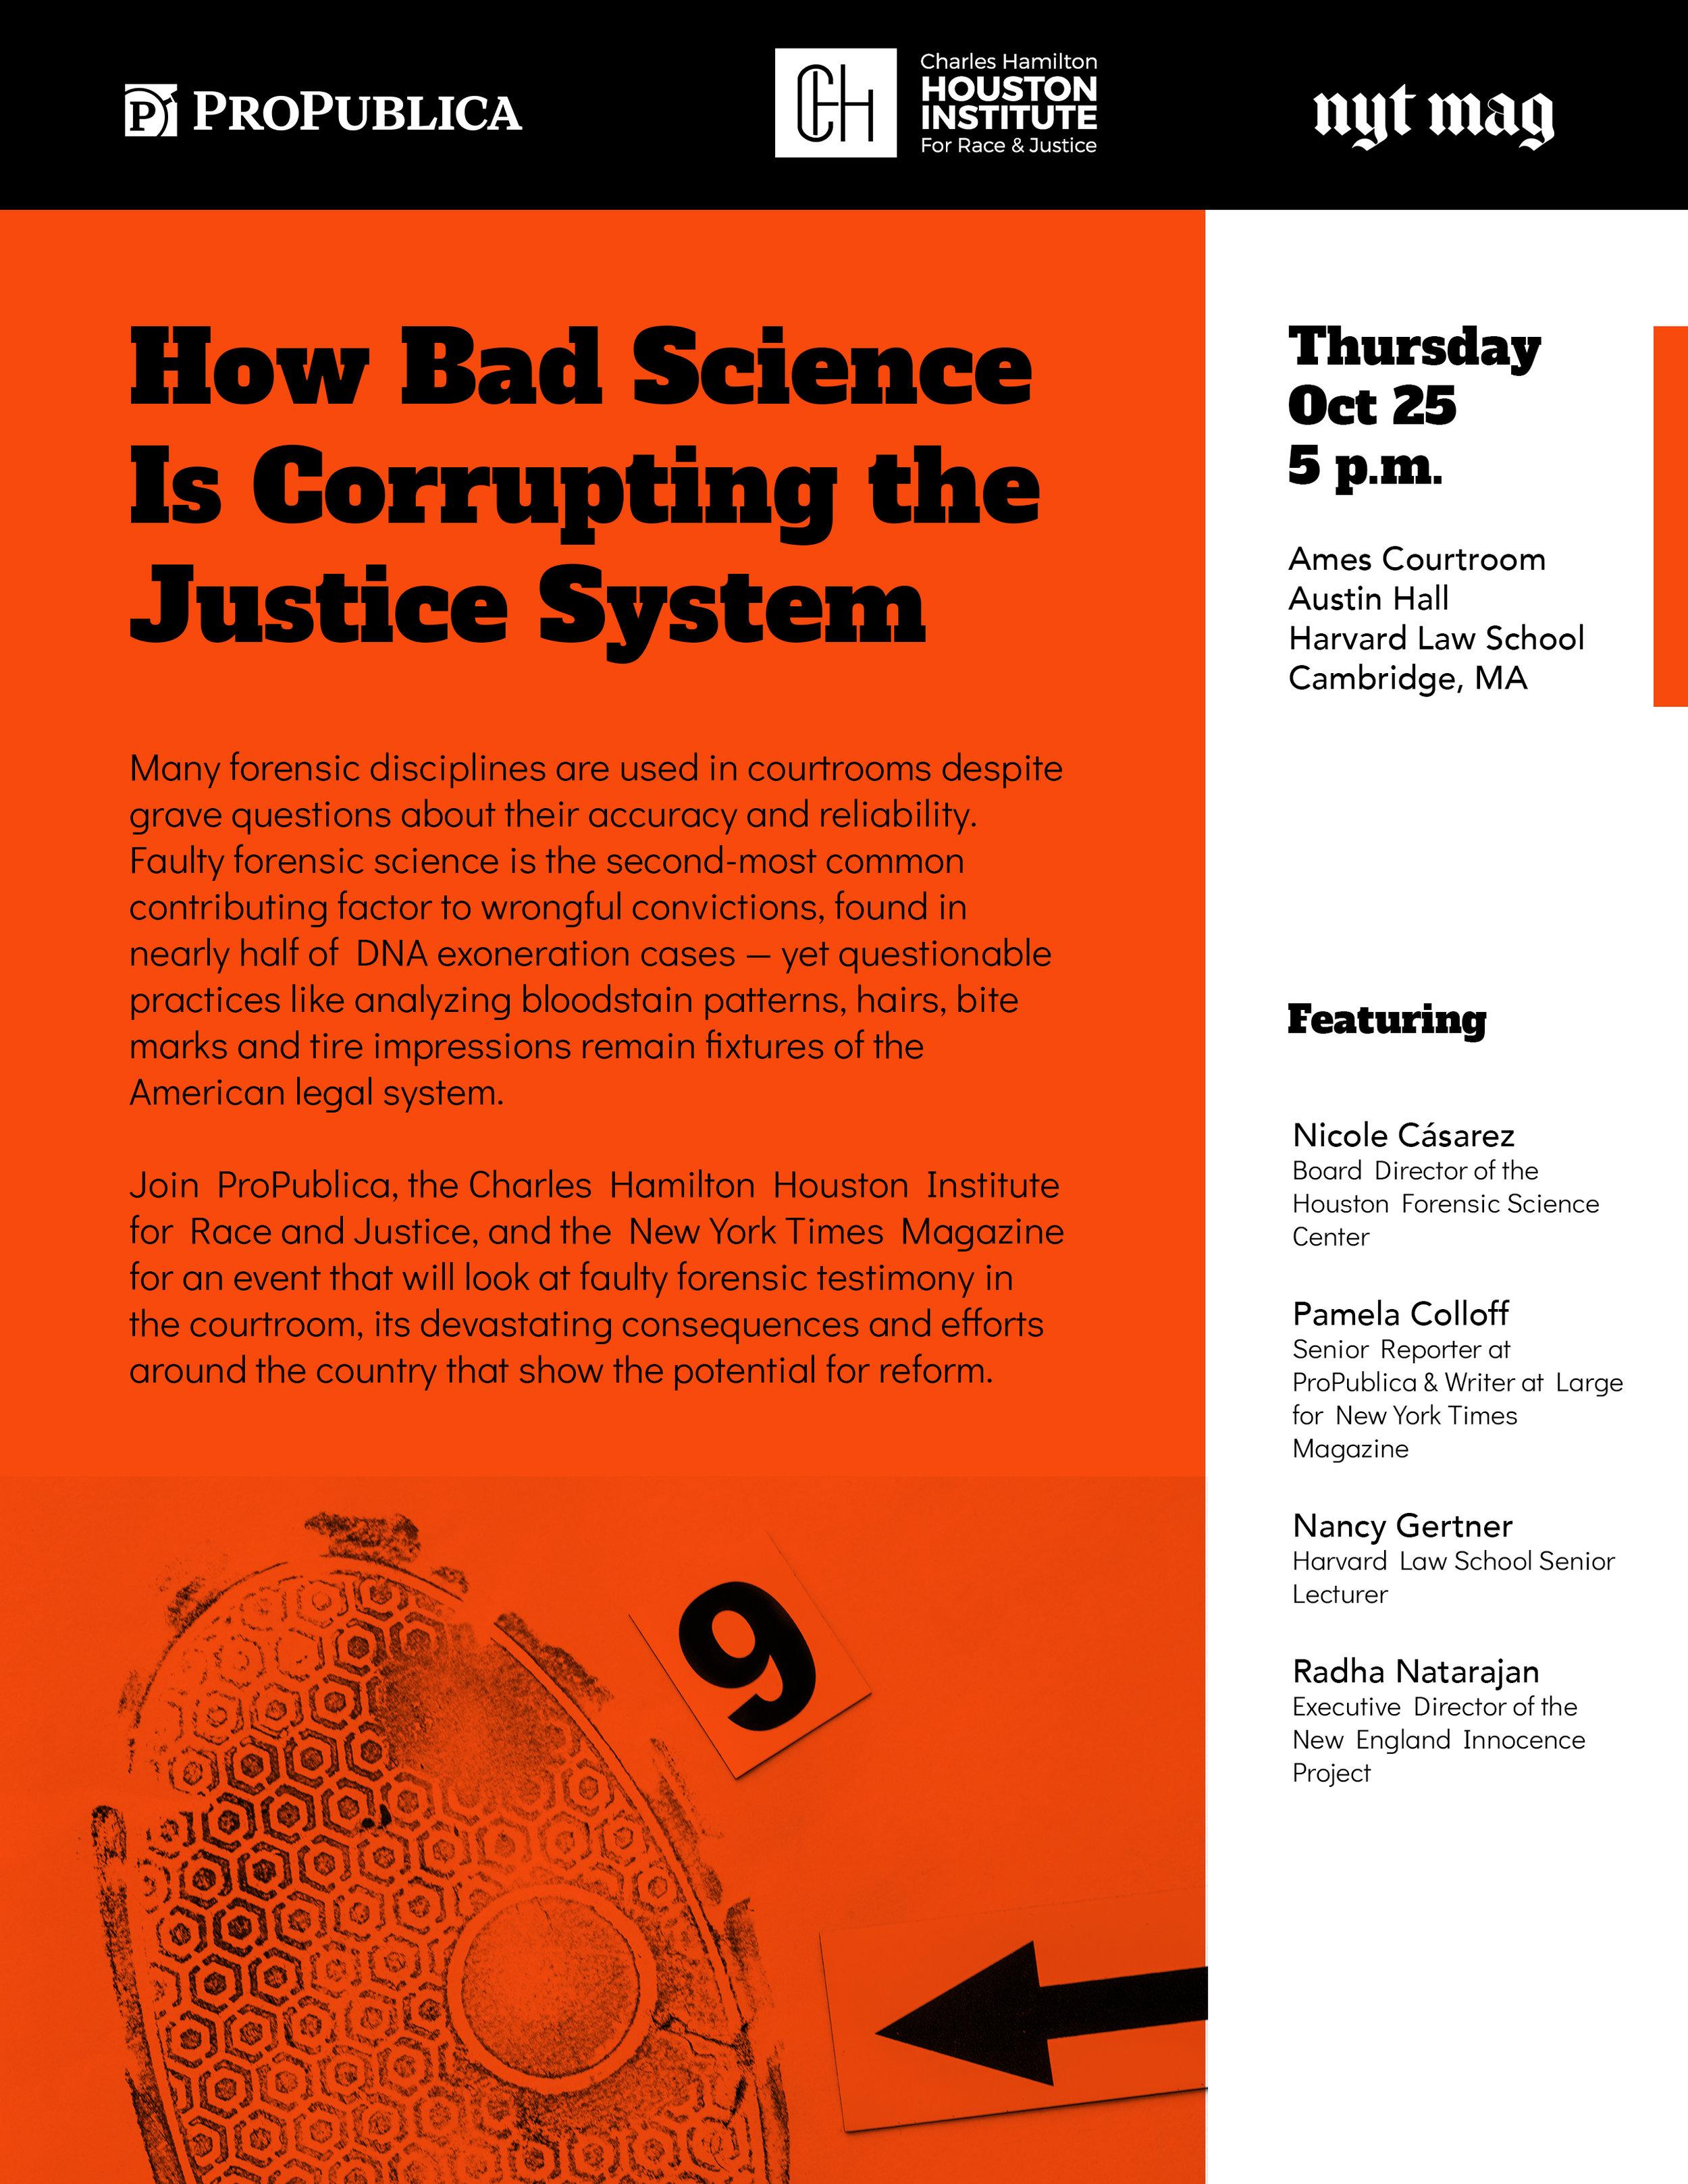 Event flyer, digital + print